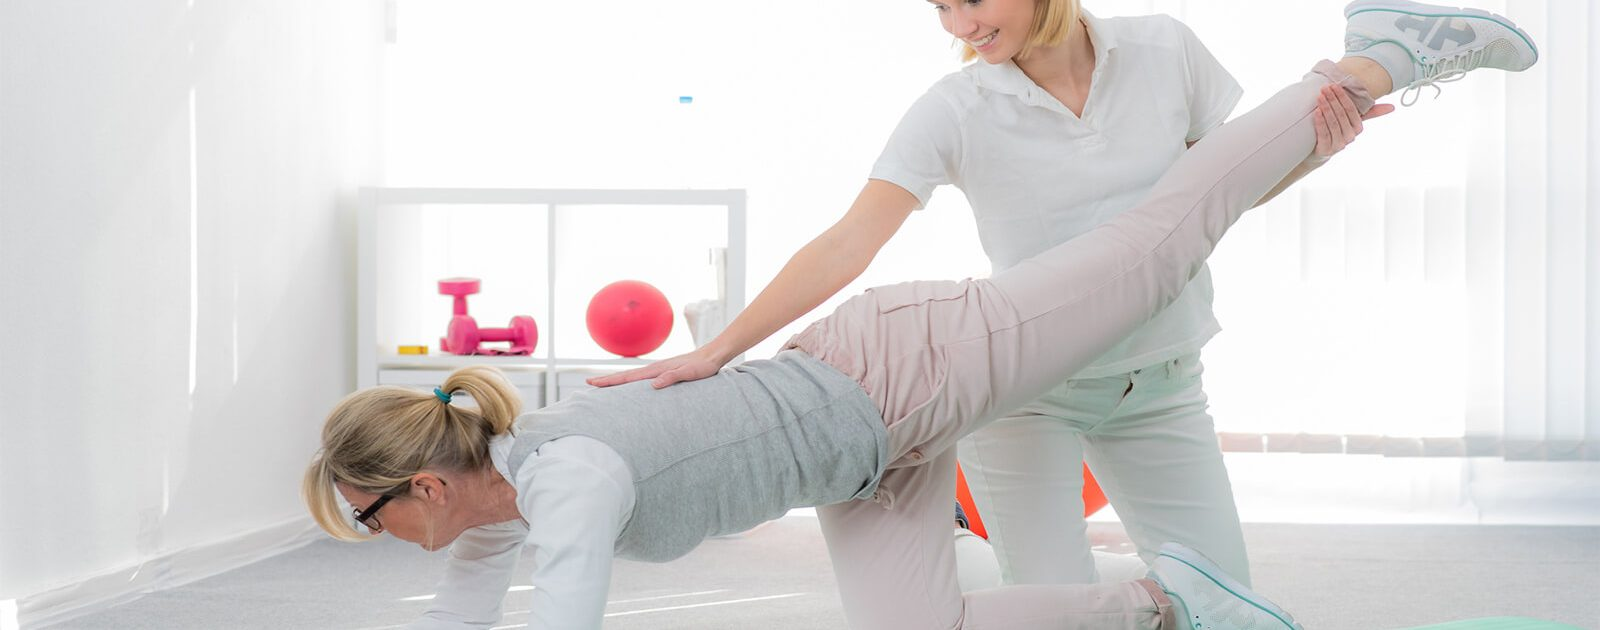 Frau leistet Patientin Hilfe bei Rückenschmerzen